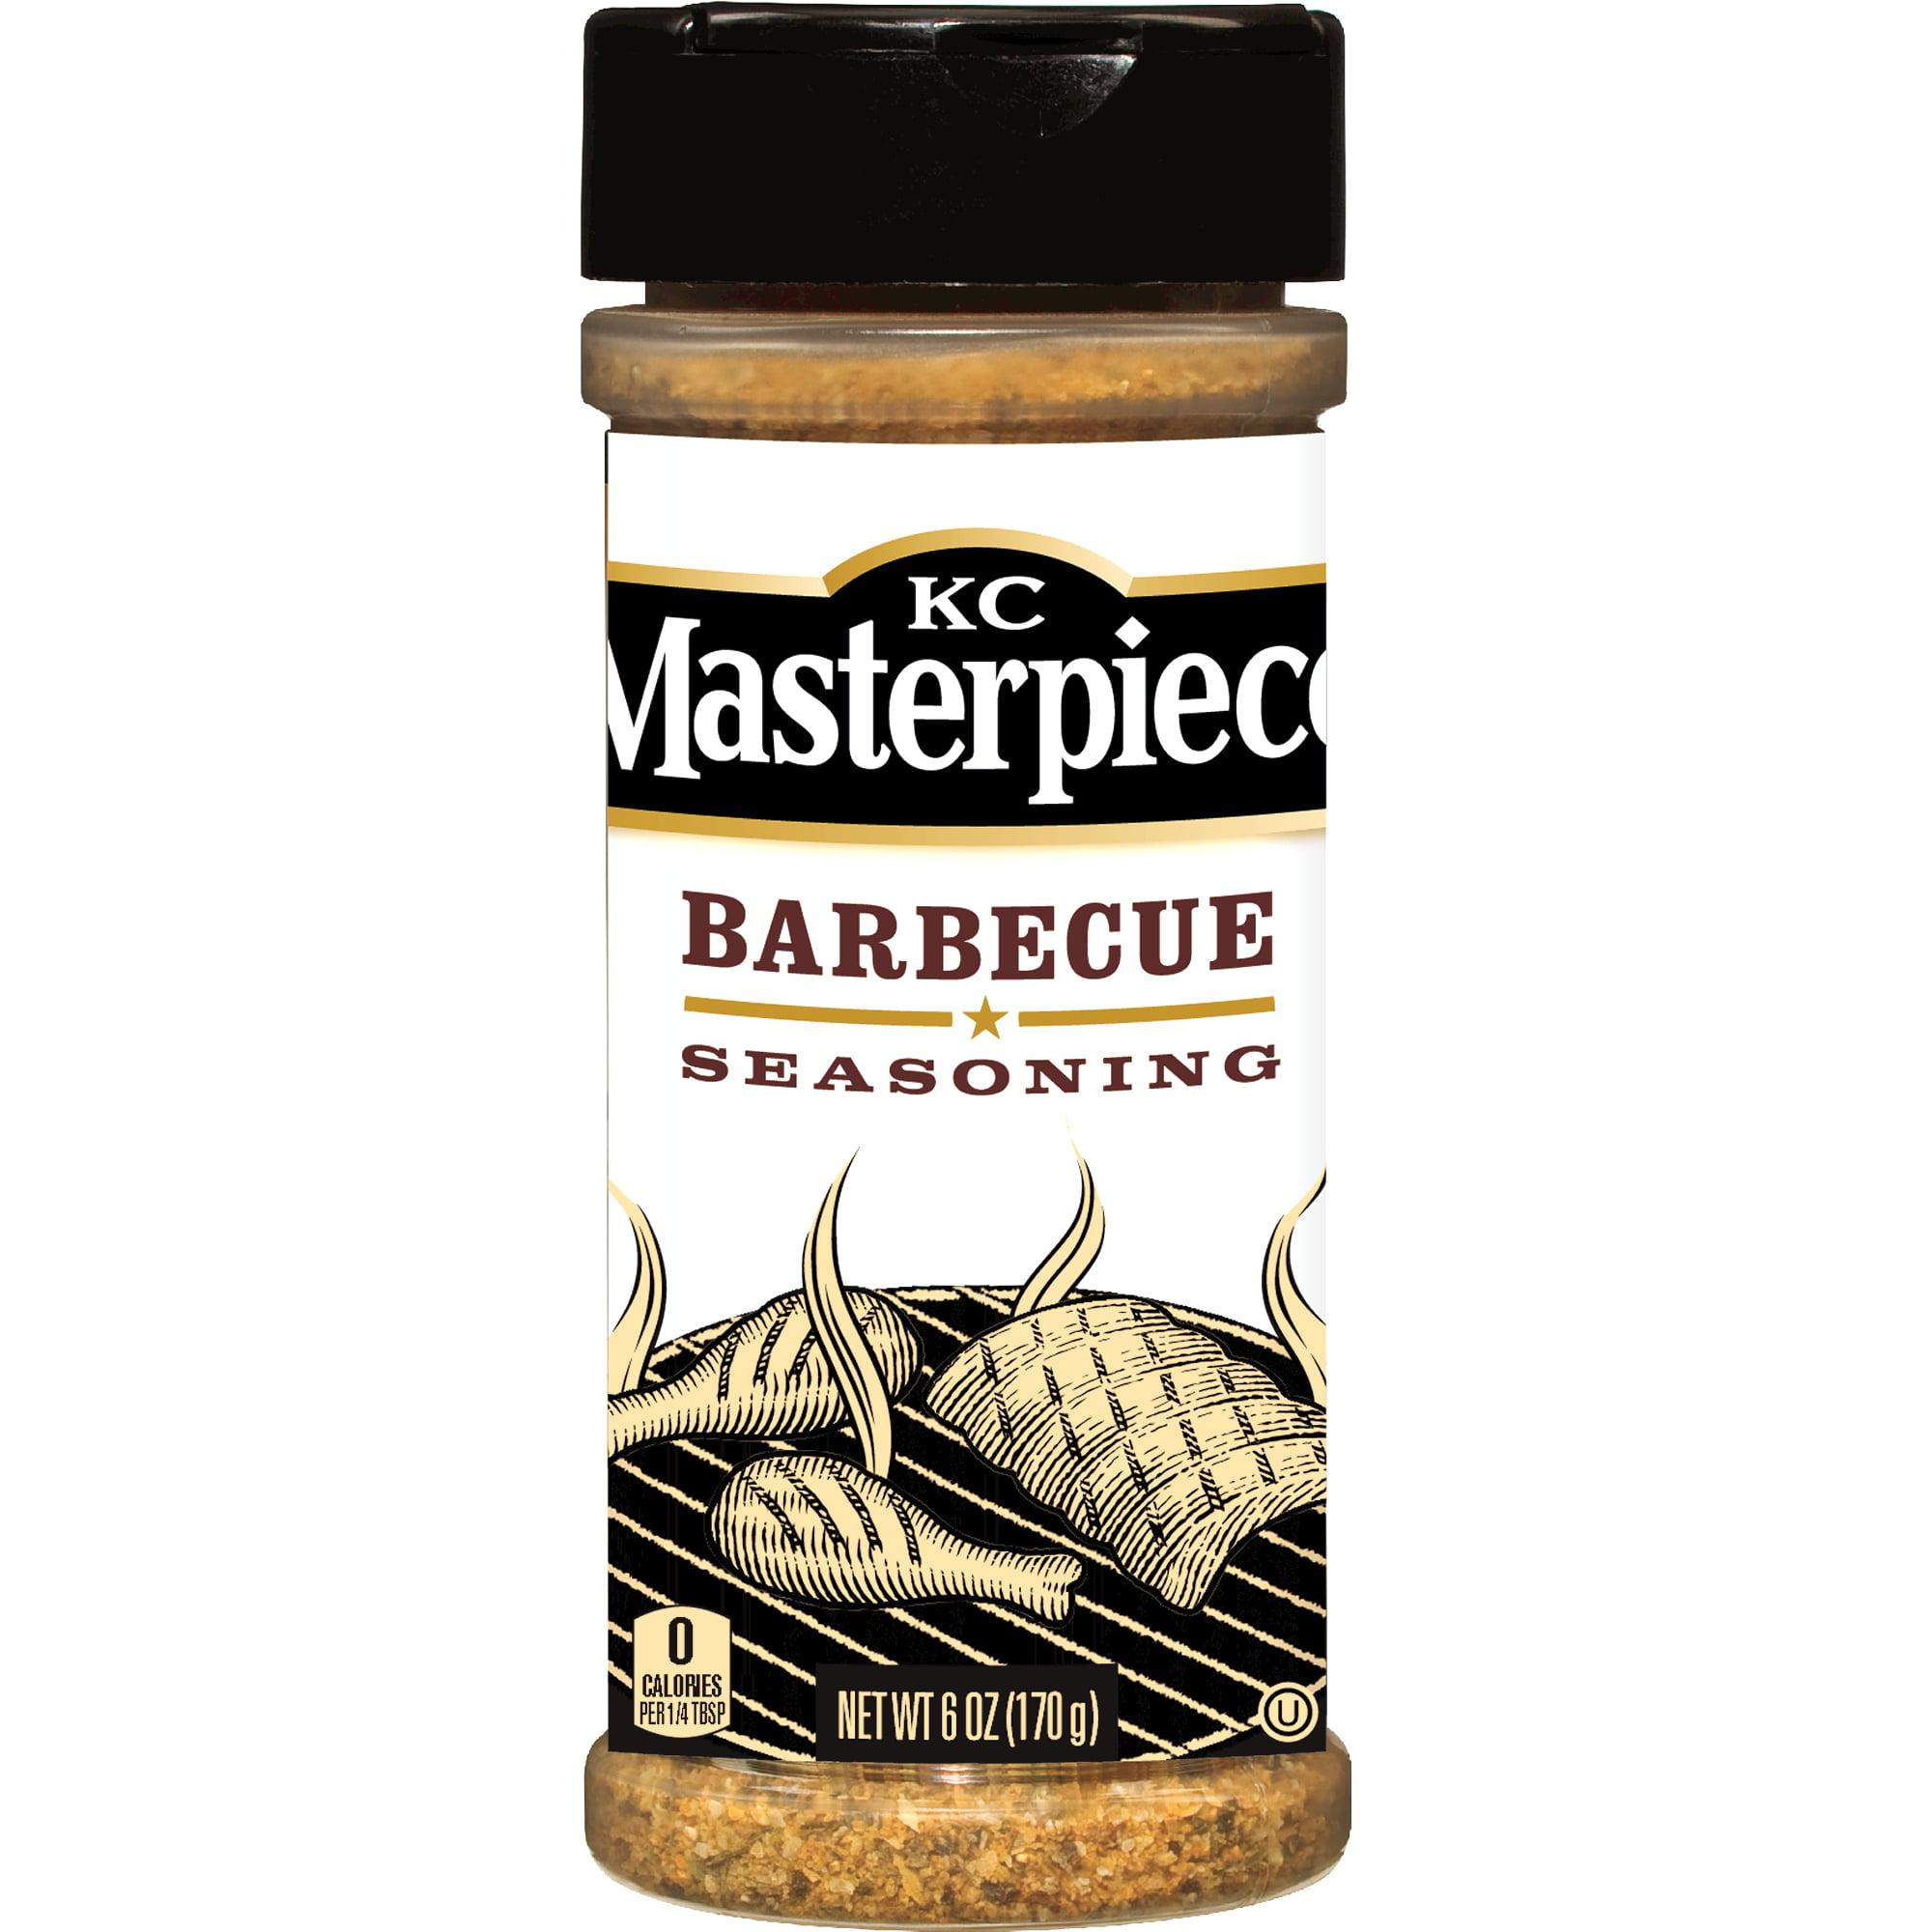 KC Masterpiece Barbecue Seasoning, 6 Ounces